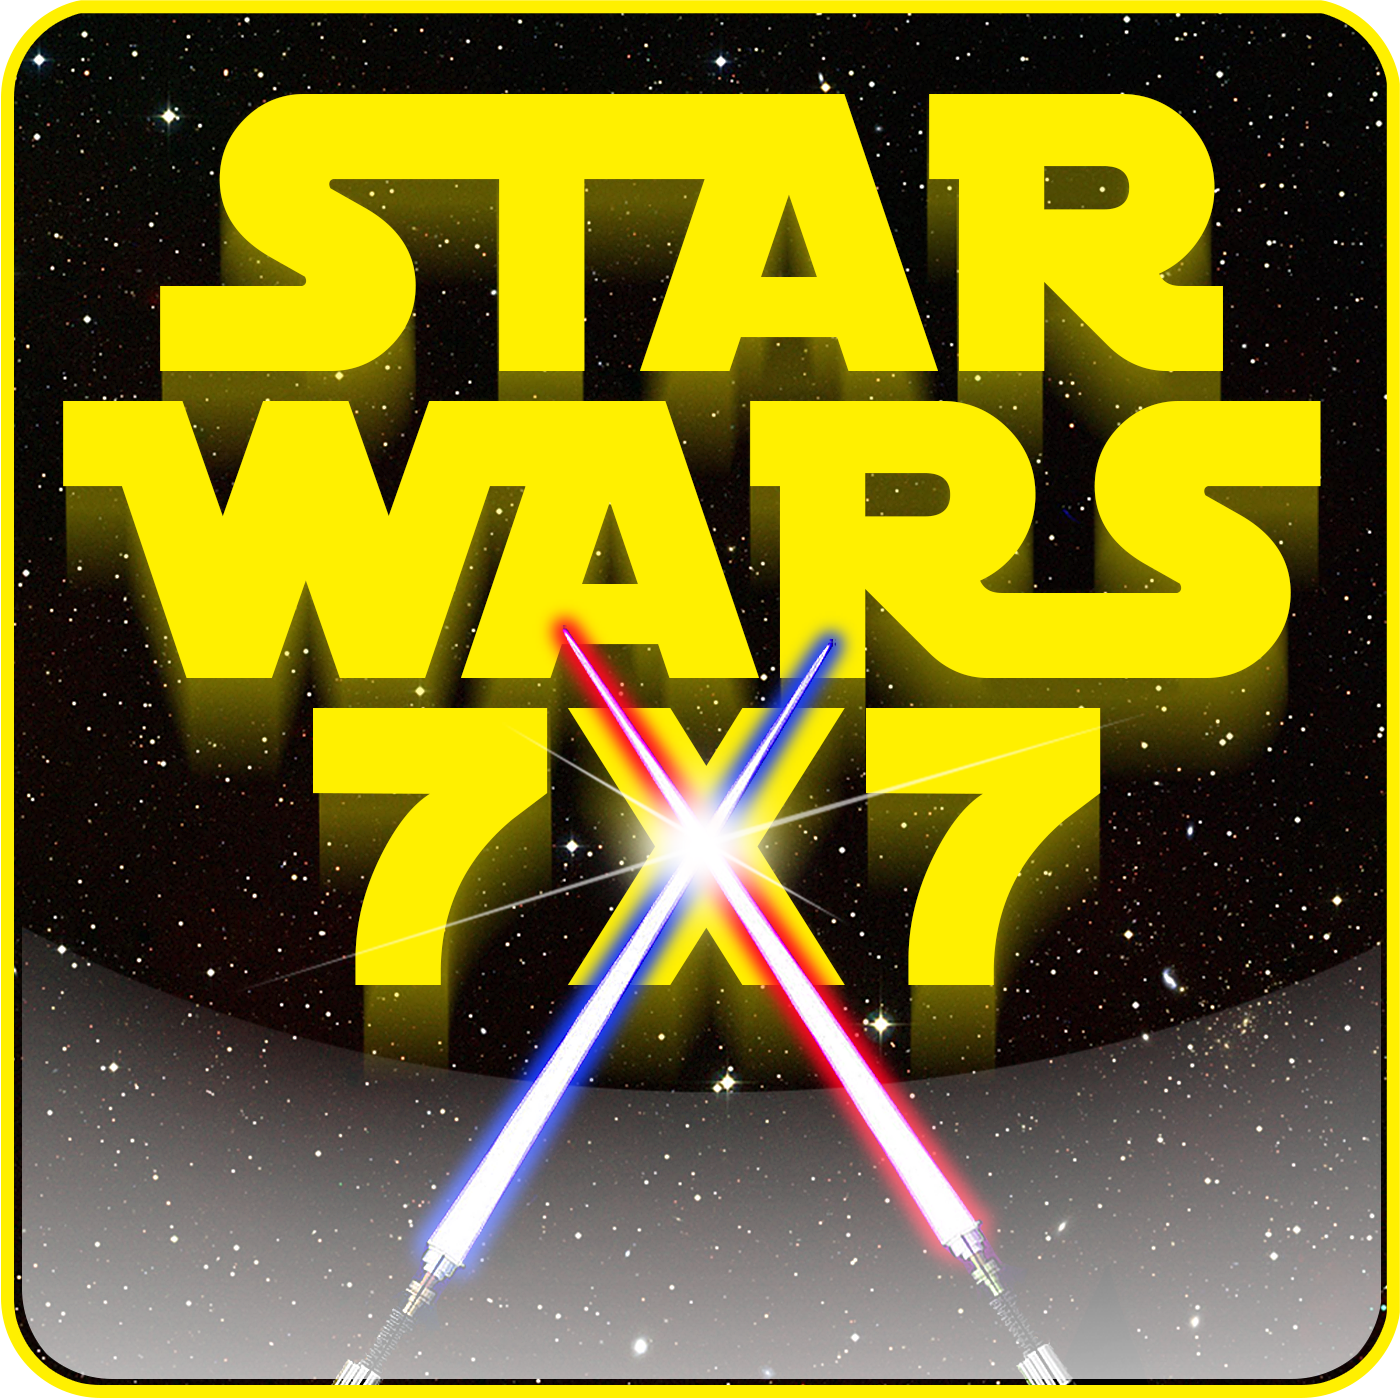 Star Wars 7x7   Star Wars News, Interviews, and More! show art